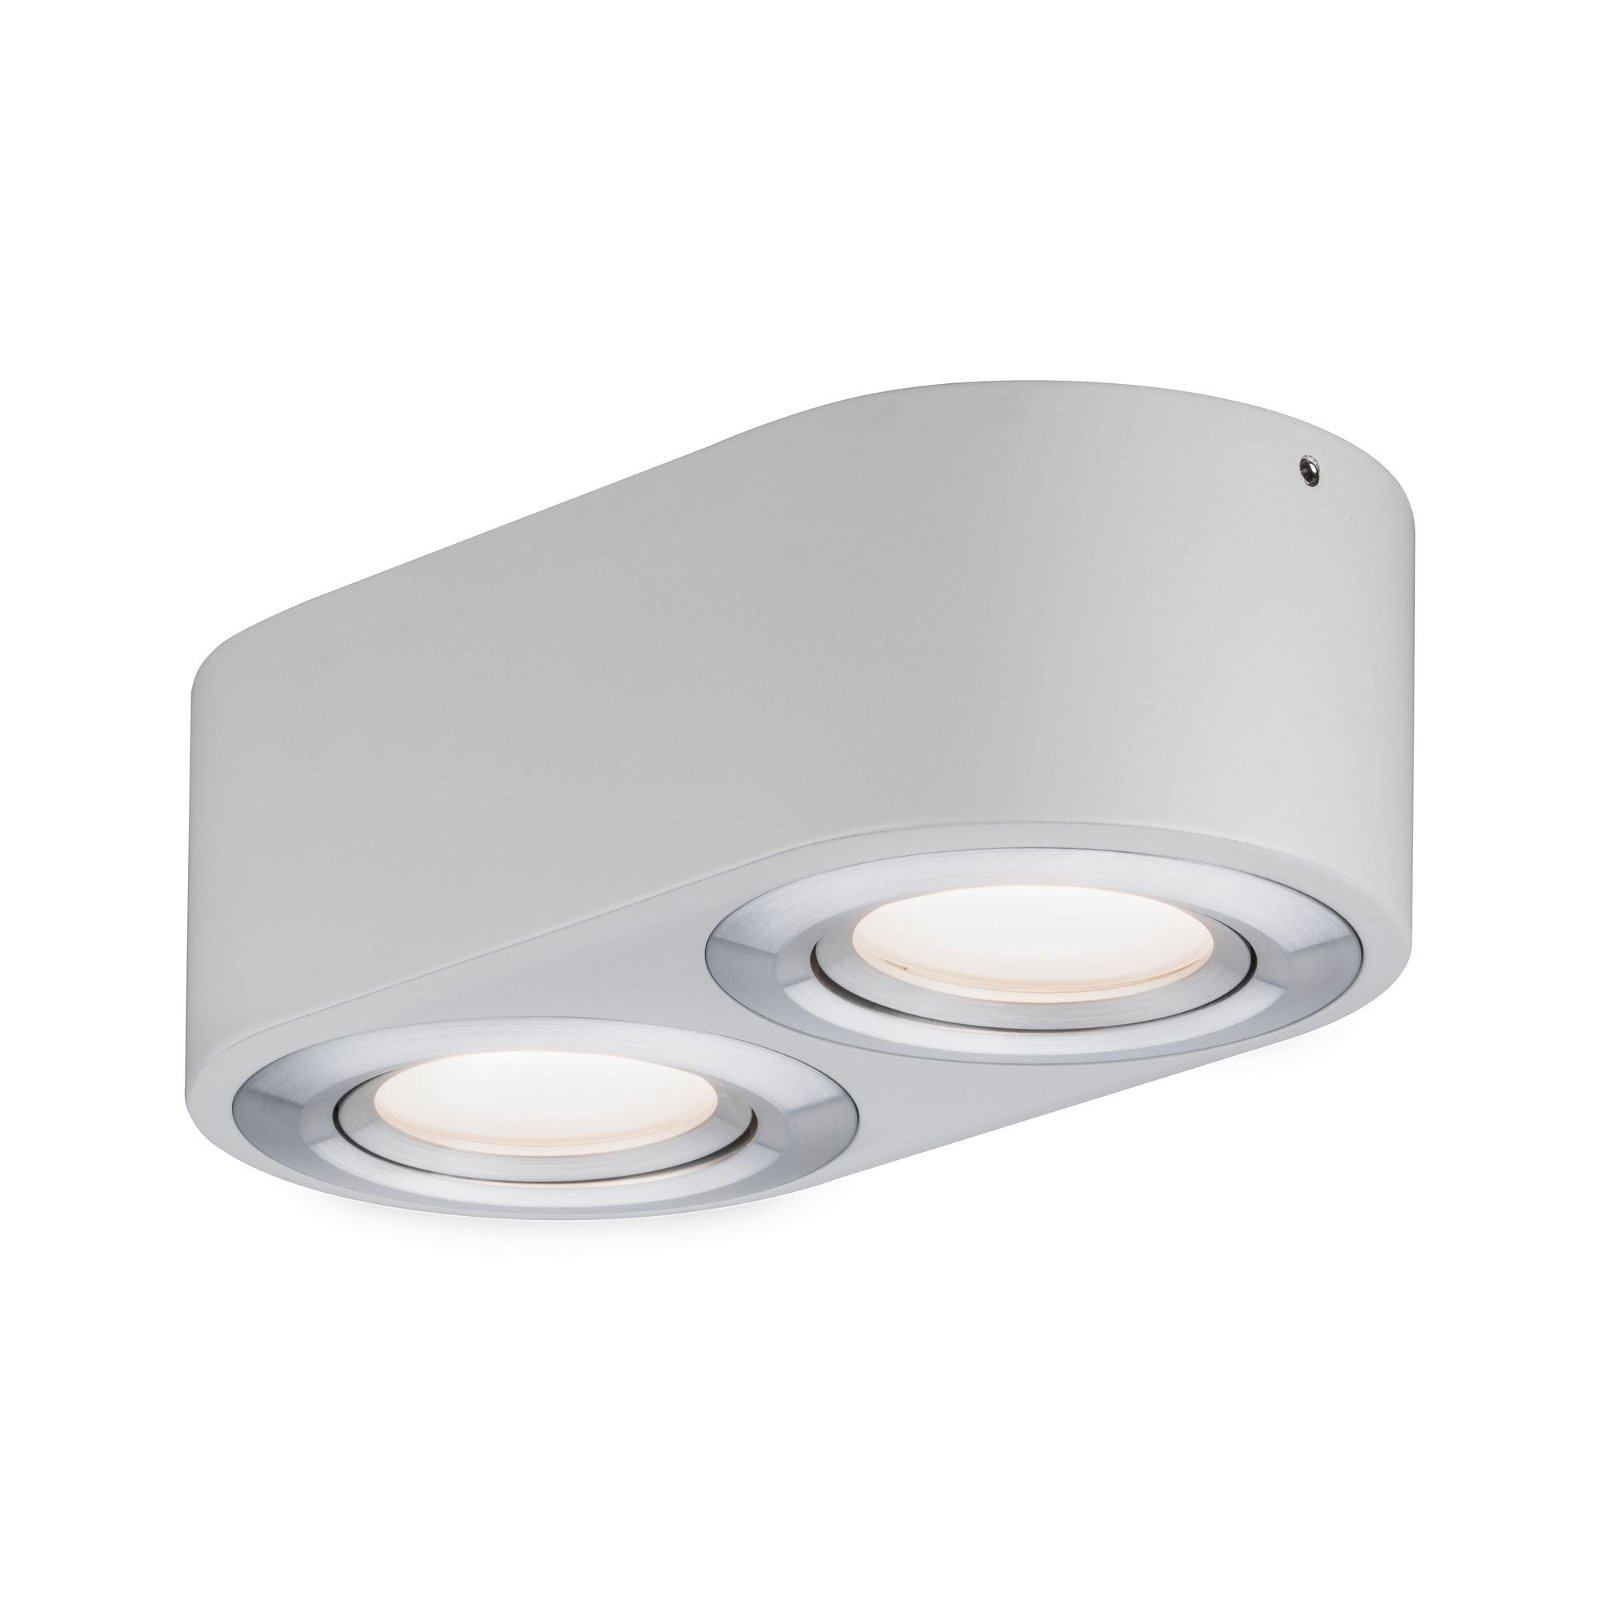 LED Wandleuchte Argun 3000K 2x475lm 230V 2x4,8W Alu gebürstet